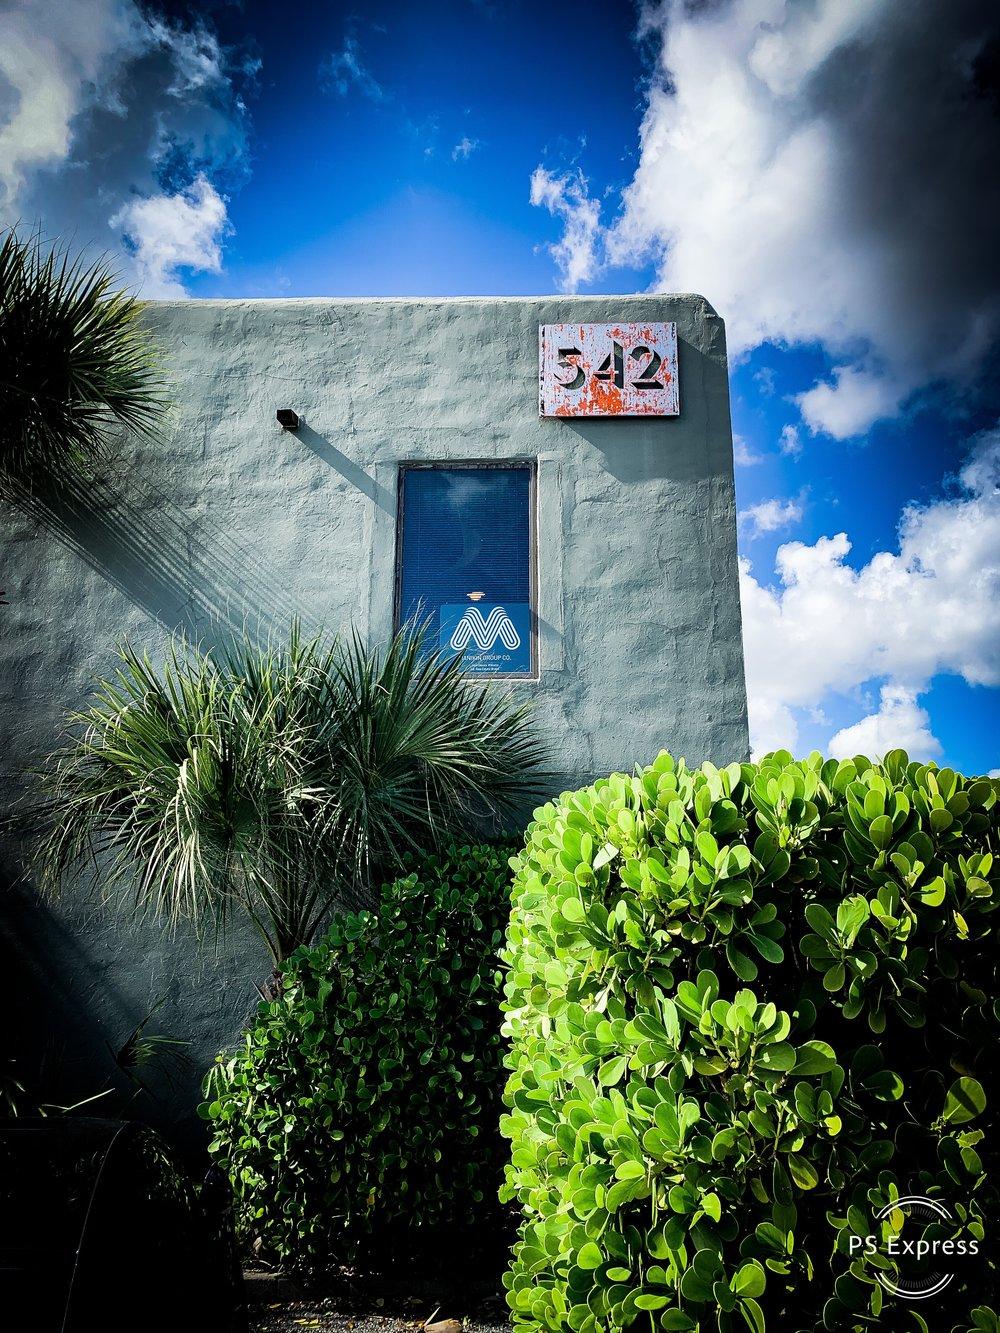 commercial property for sale west palm beach development florida